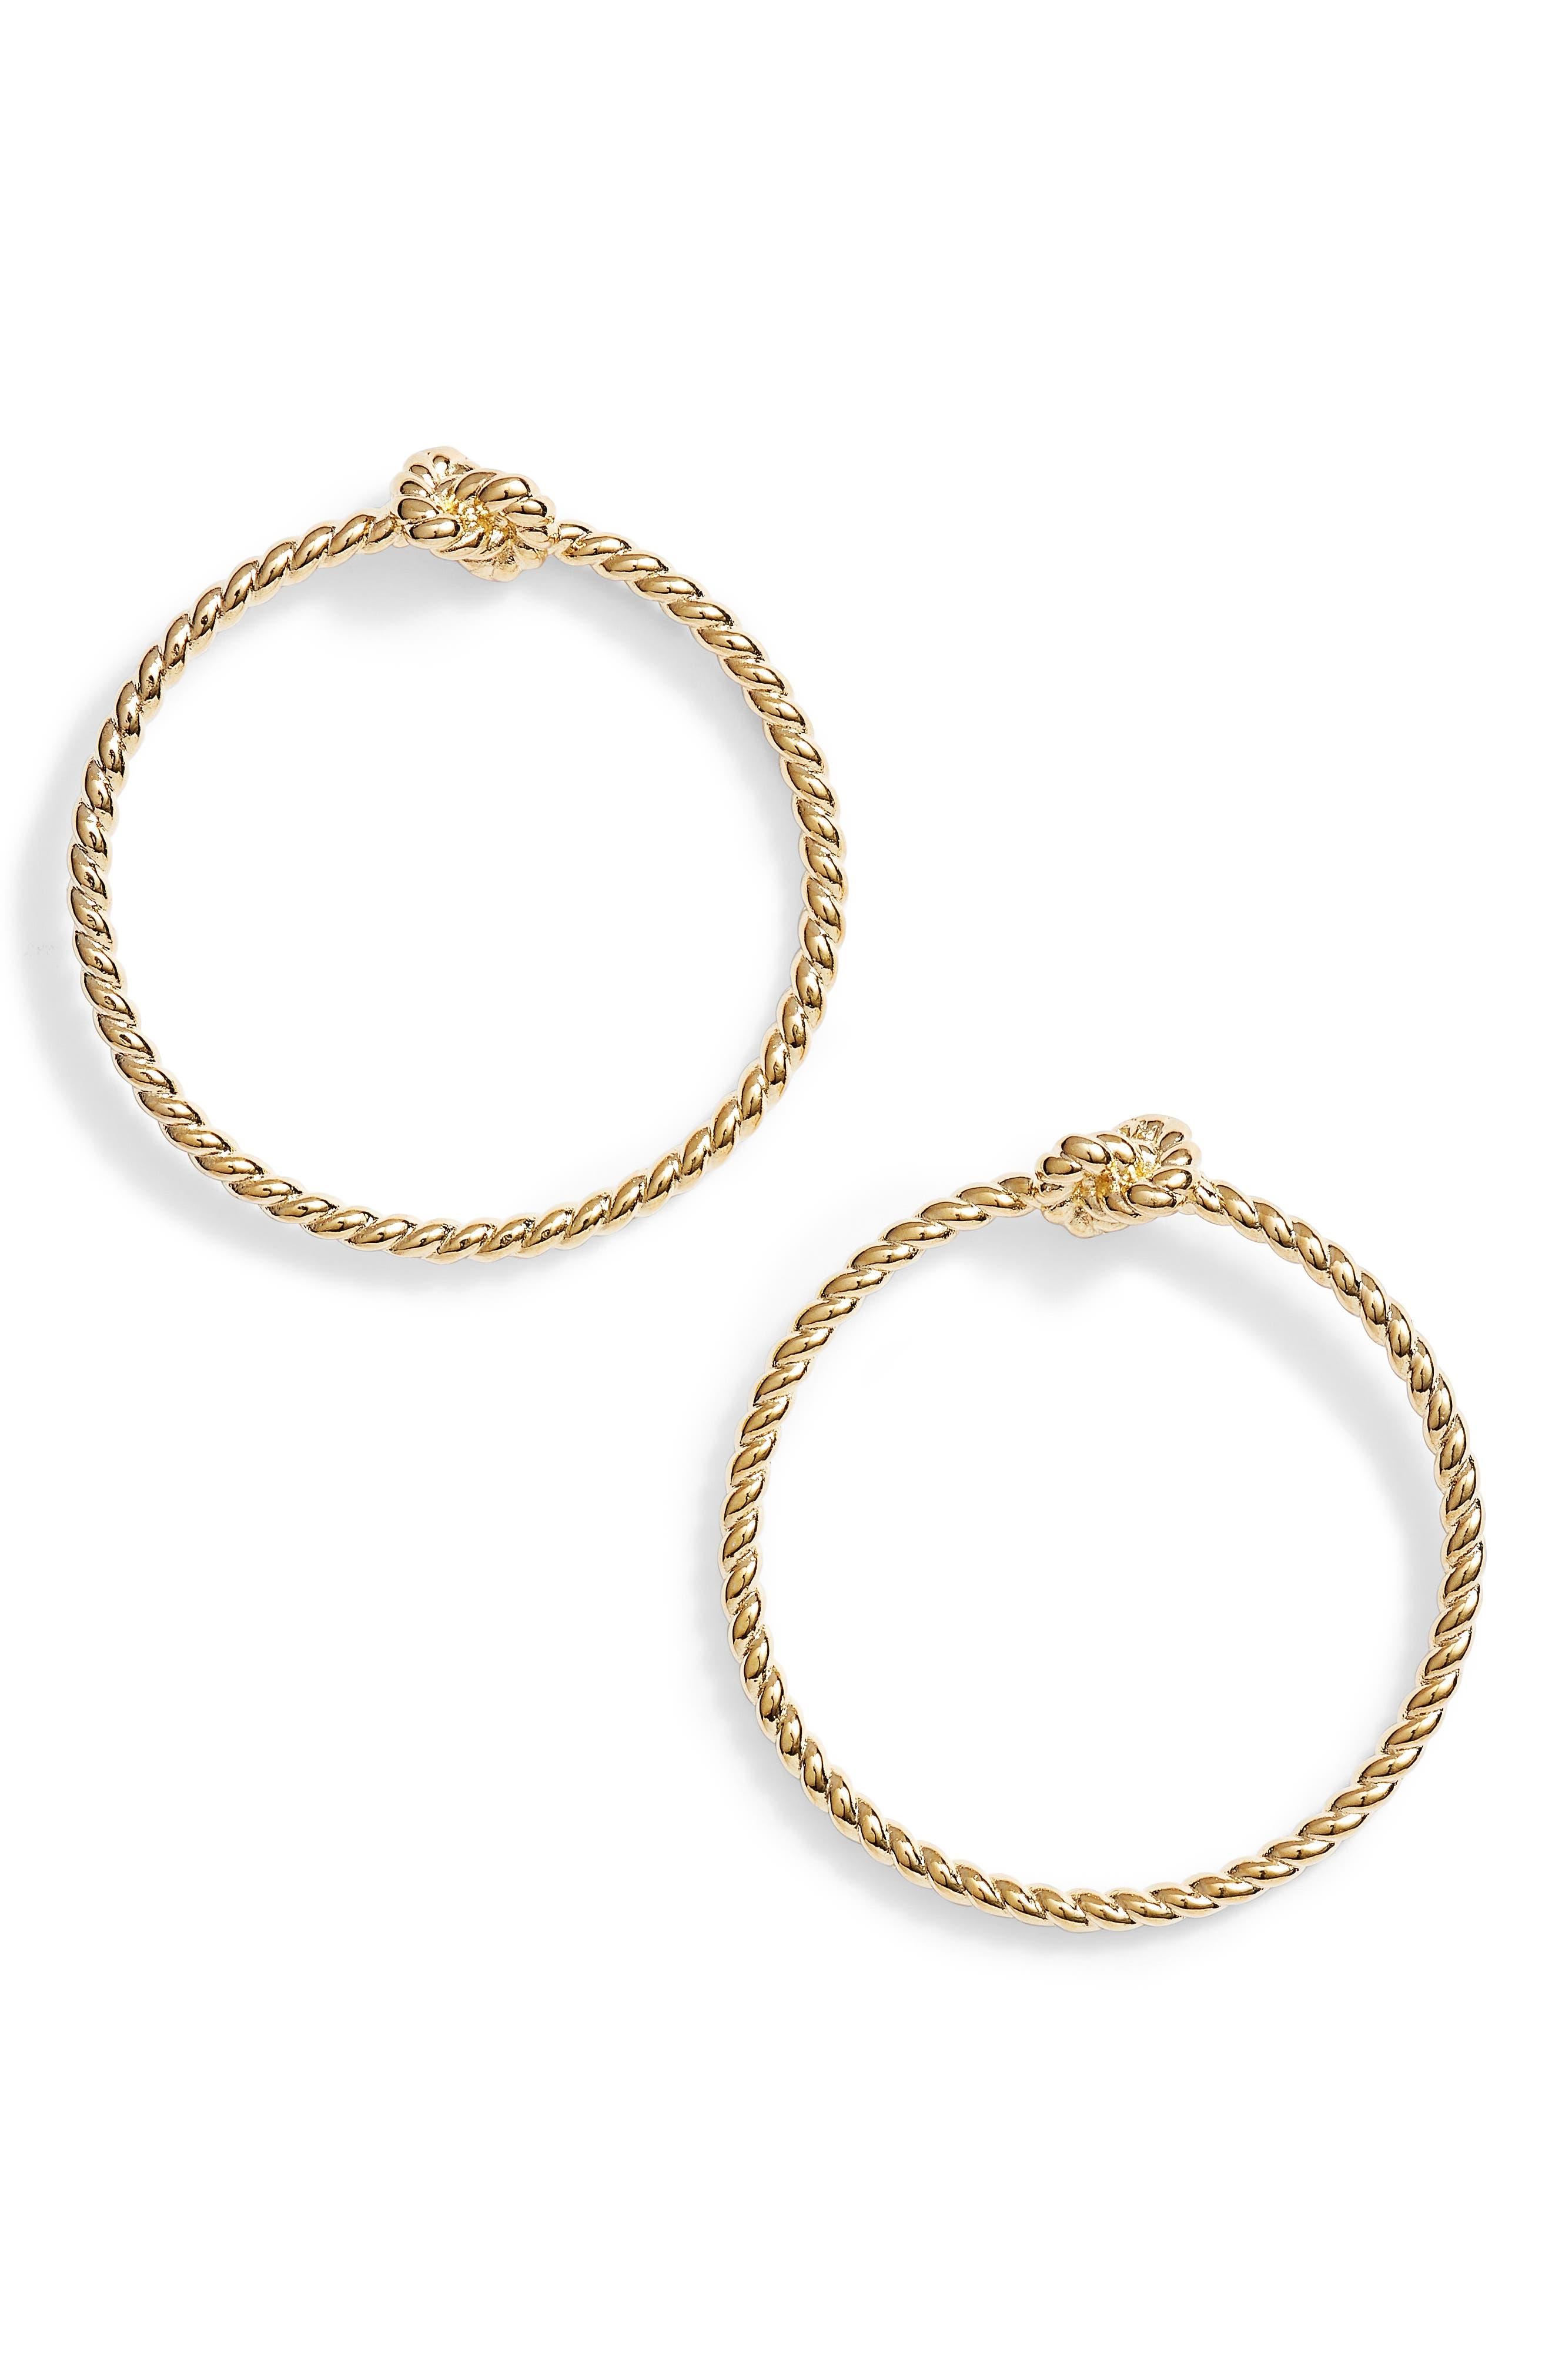 sailor knot door knocker hoop earrings,                         Main,                         color, Gold